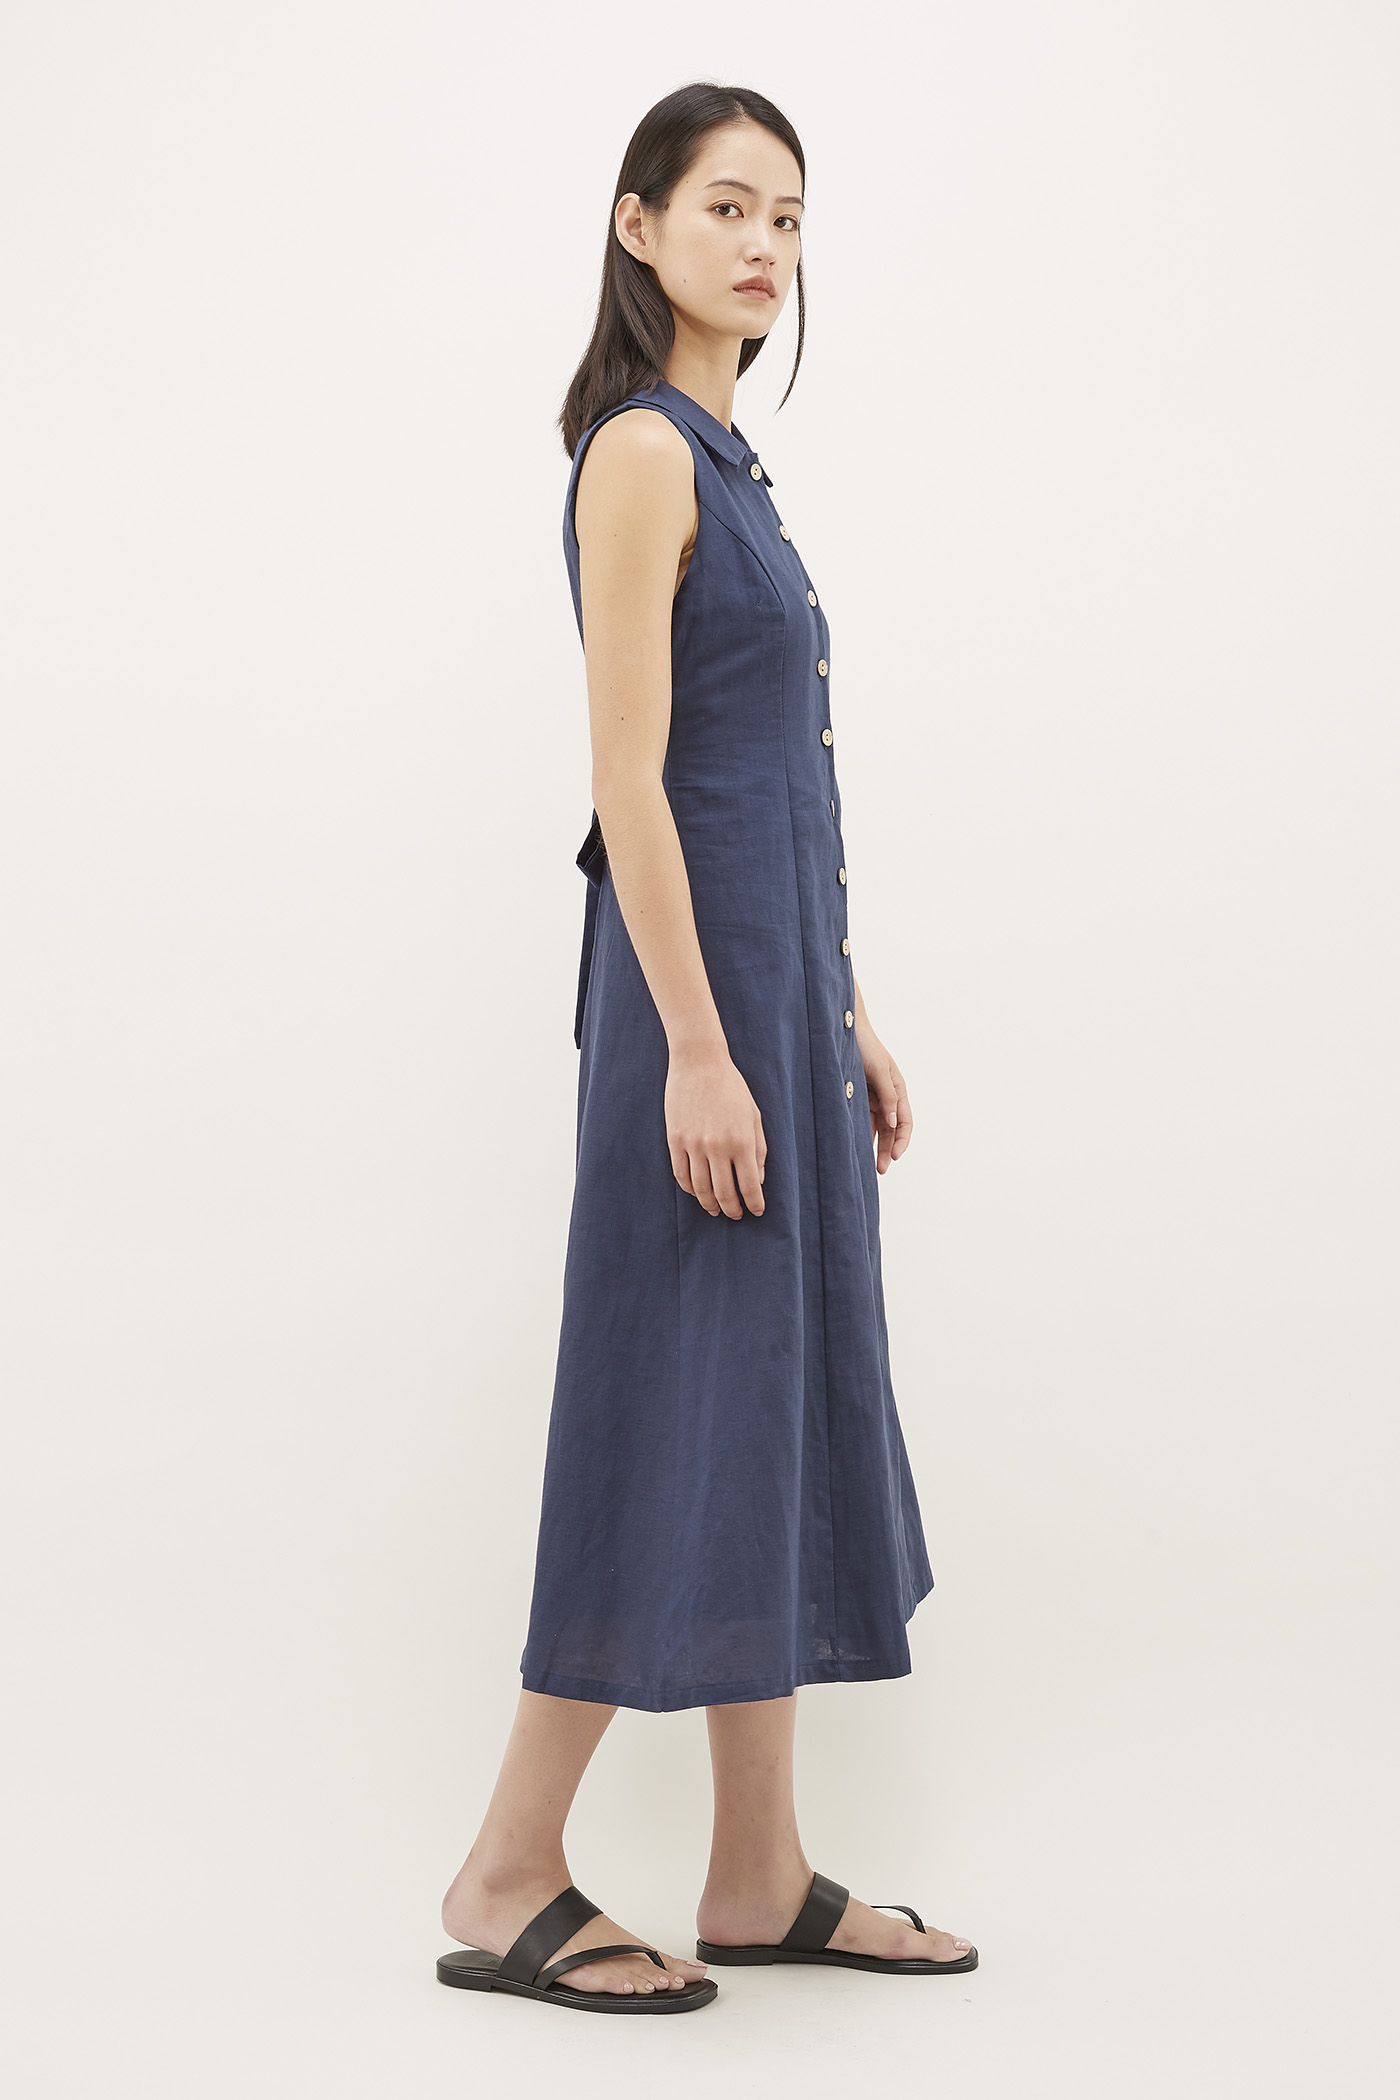 Kirby Collared Dress